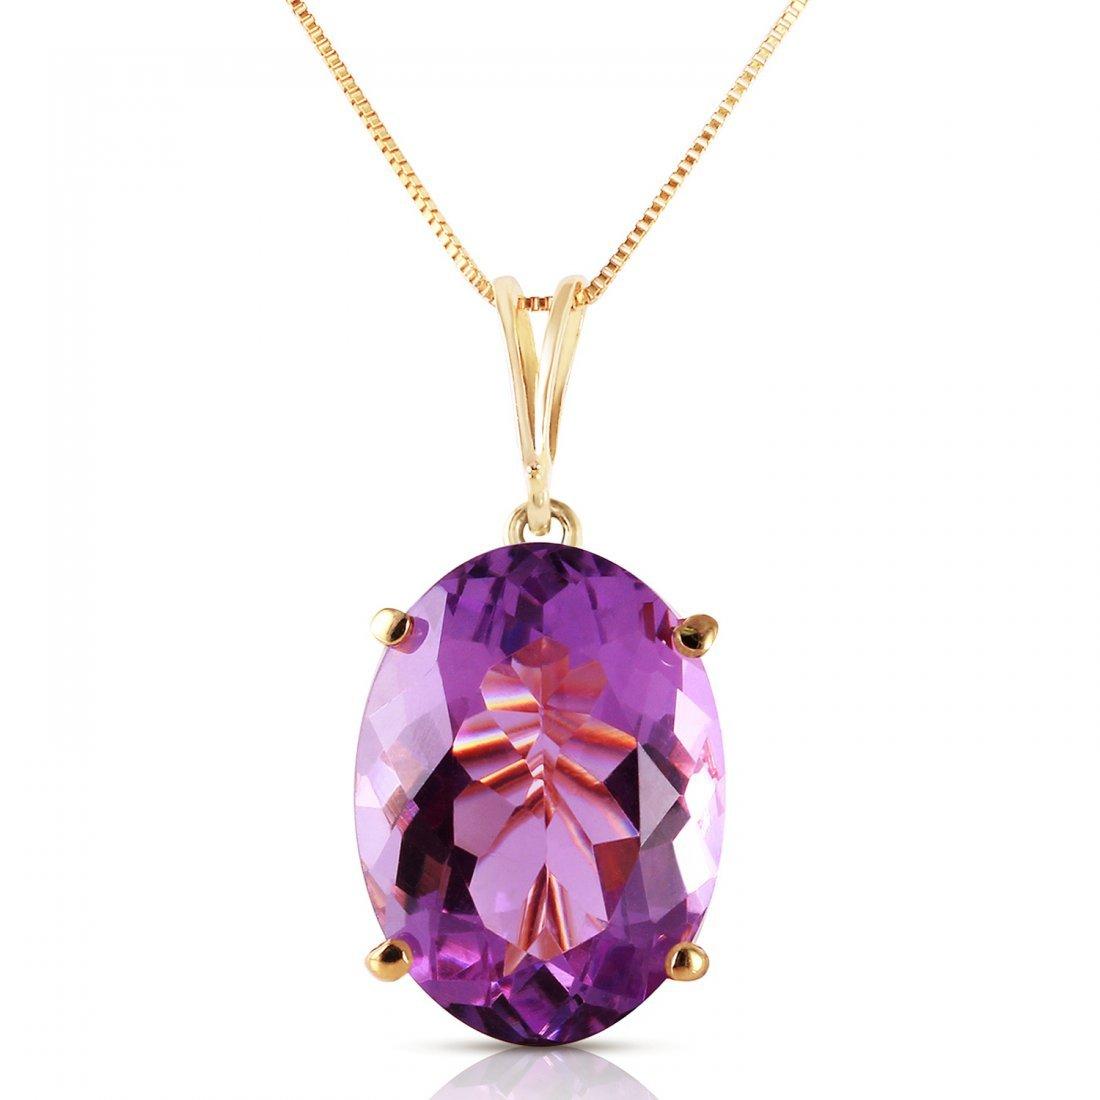 Genuine 7.55 ctw Amethyst Necklace Jewelry 14KT Yellow